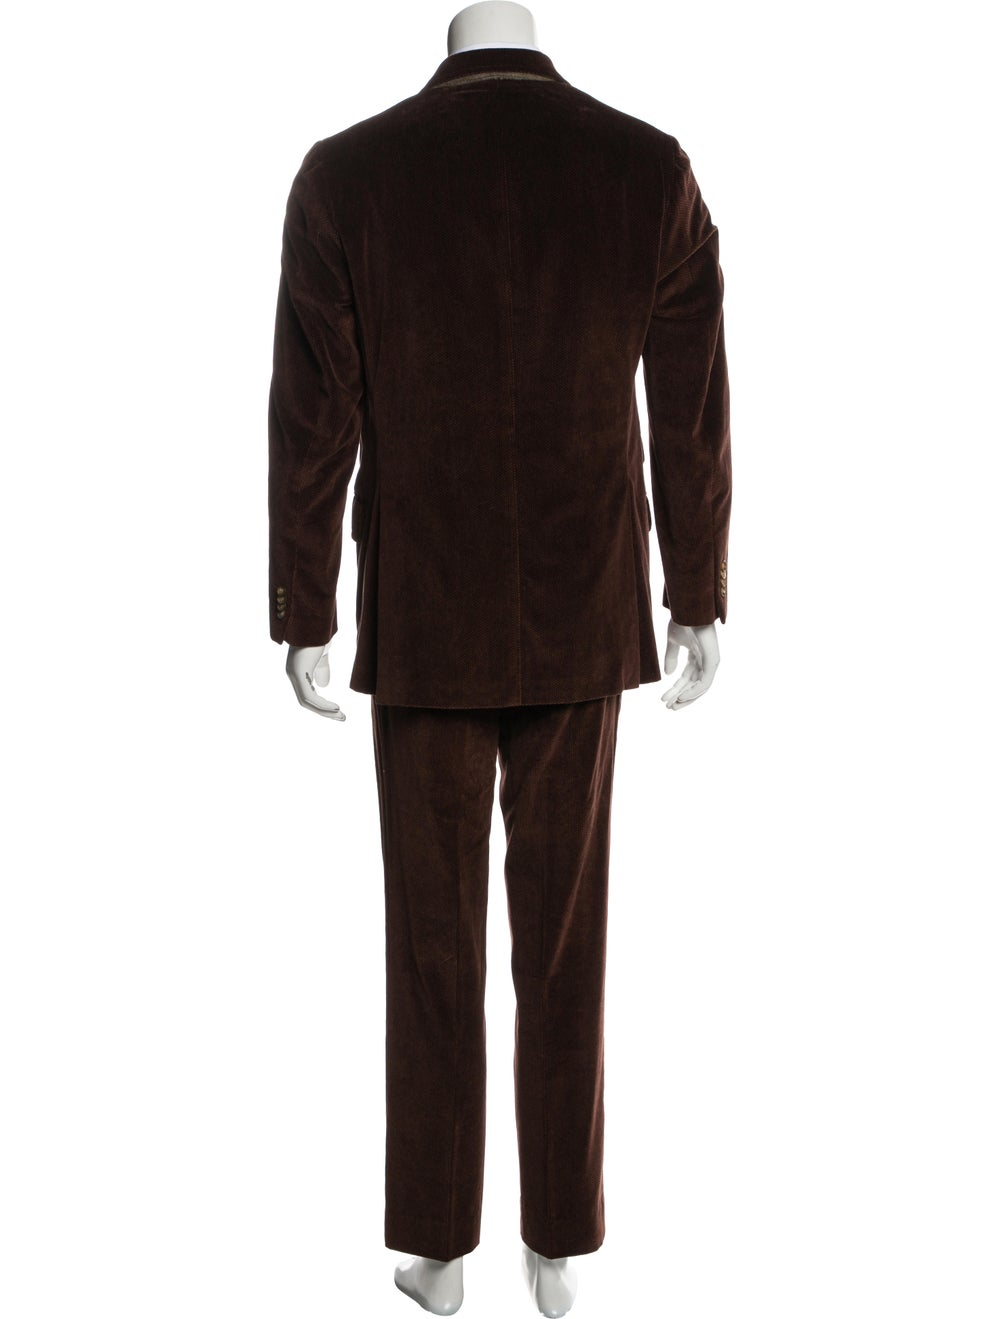 Etro Corduroy Two-Piece Suit brown - image 3